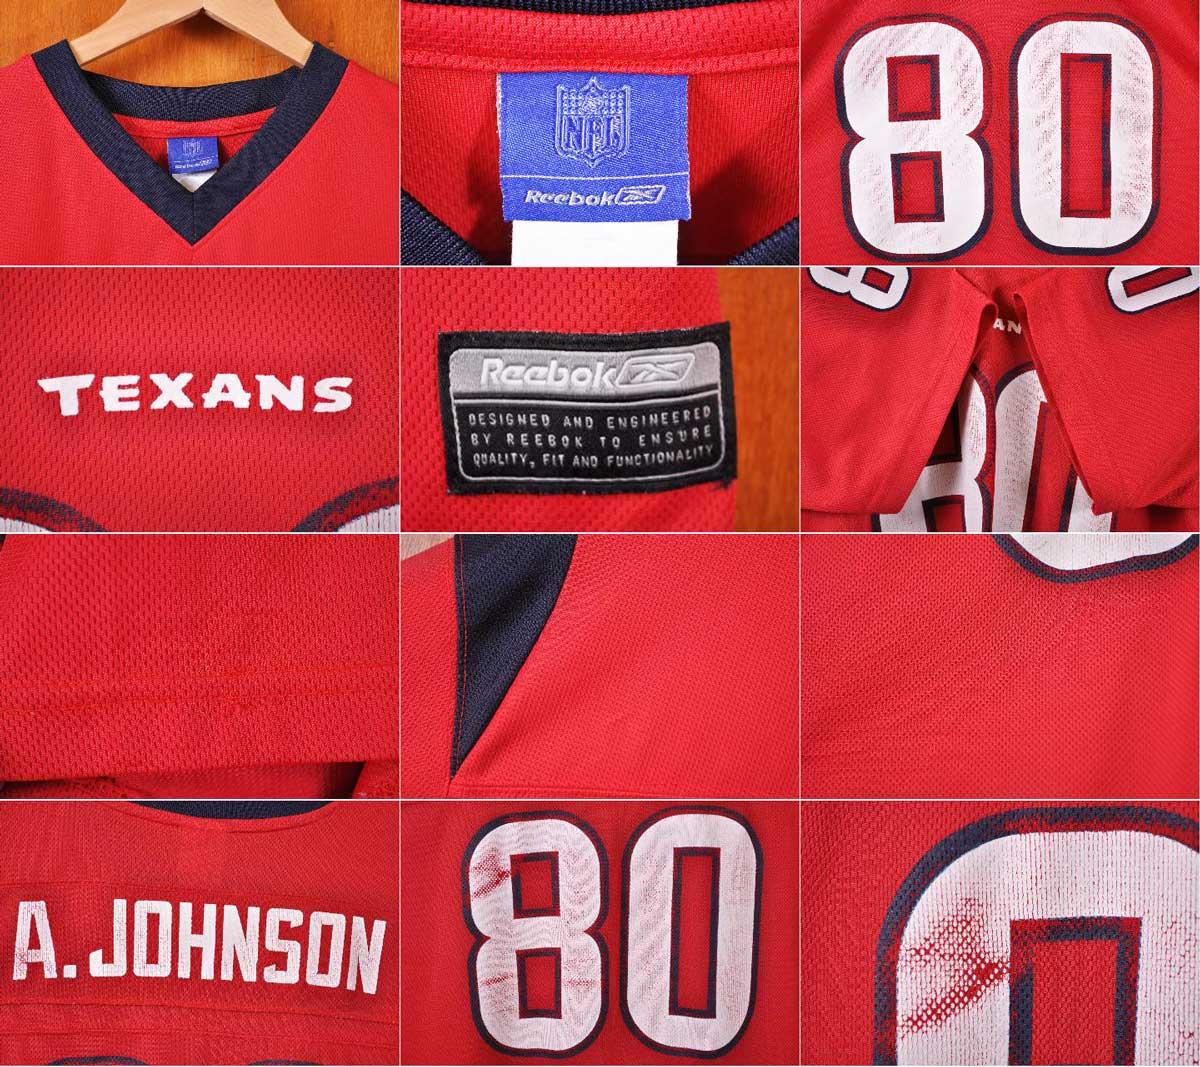 Reebok Reebok   NFL Houston Texans Houston Texans   Andre   Johnson   football  shirt numbering mesh Jersey   Red   Navy   mens L ▽ e0fa03d7f